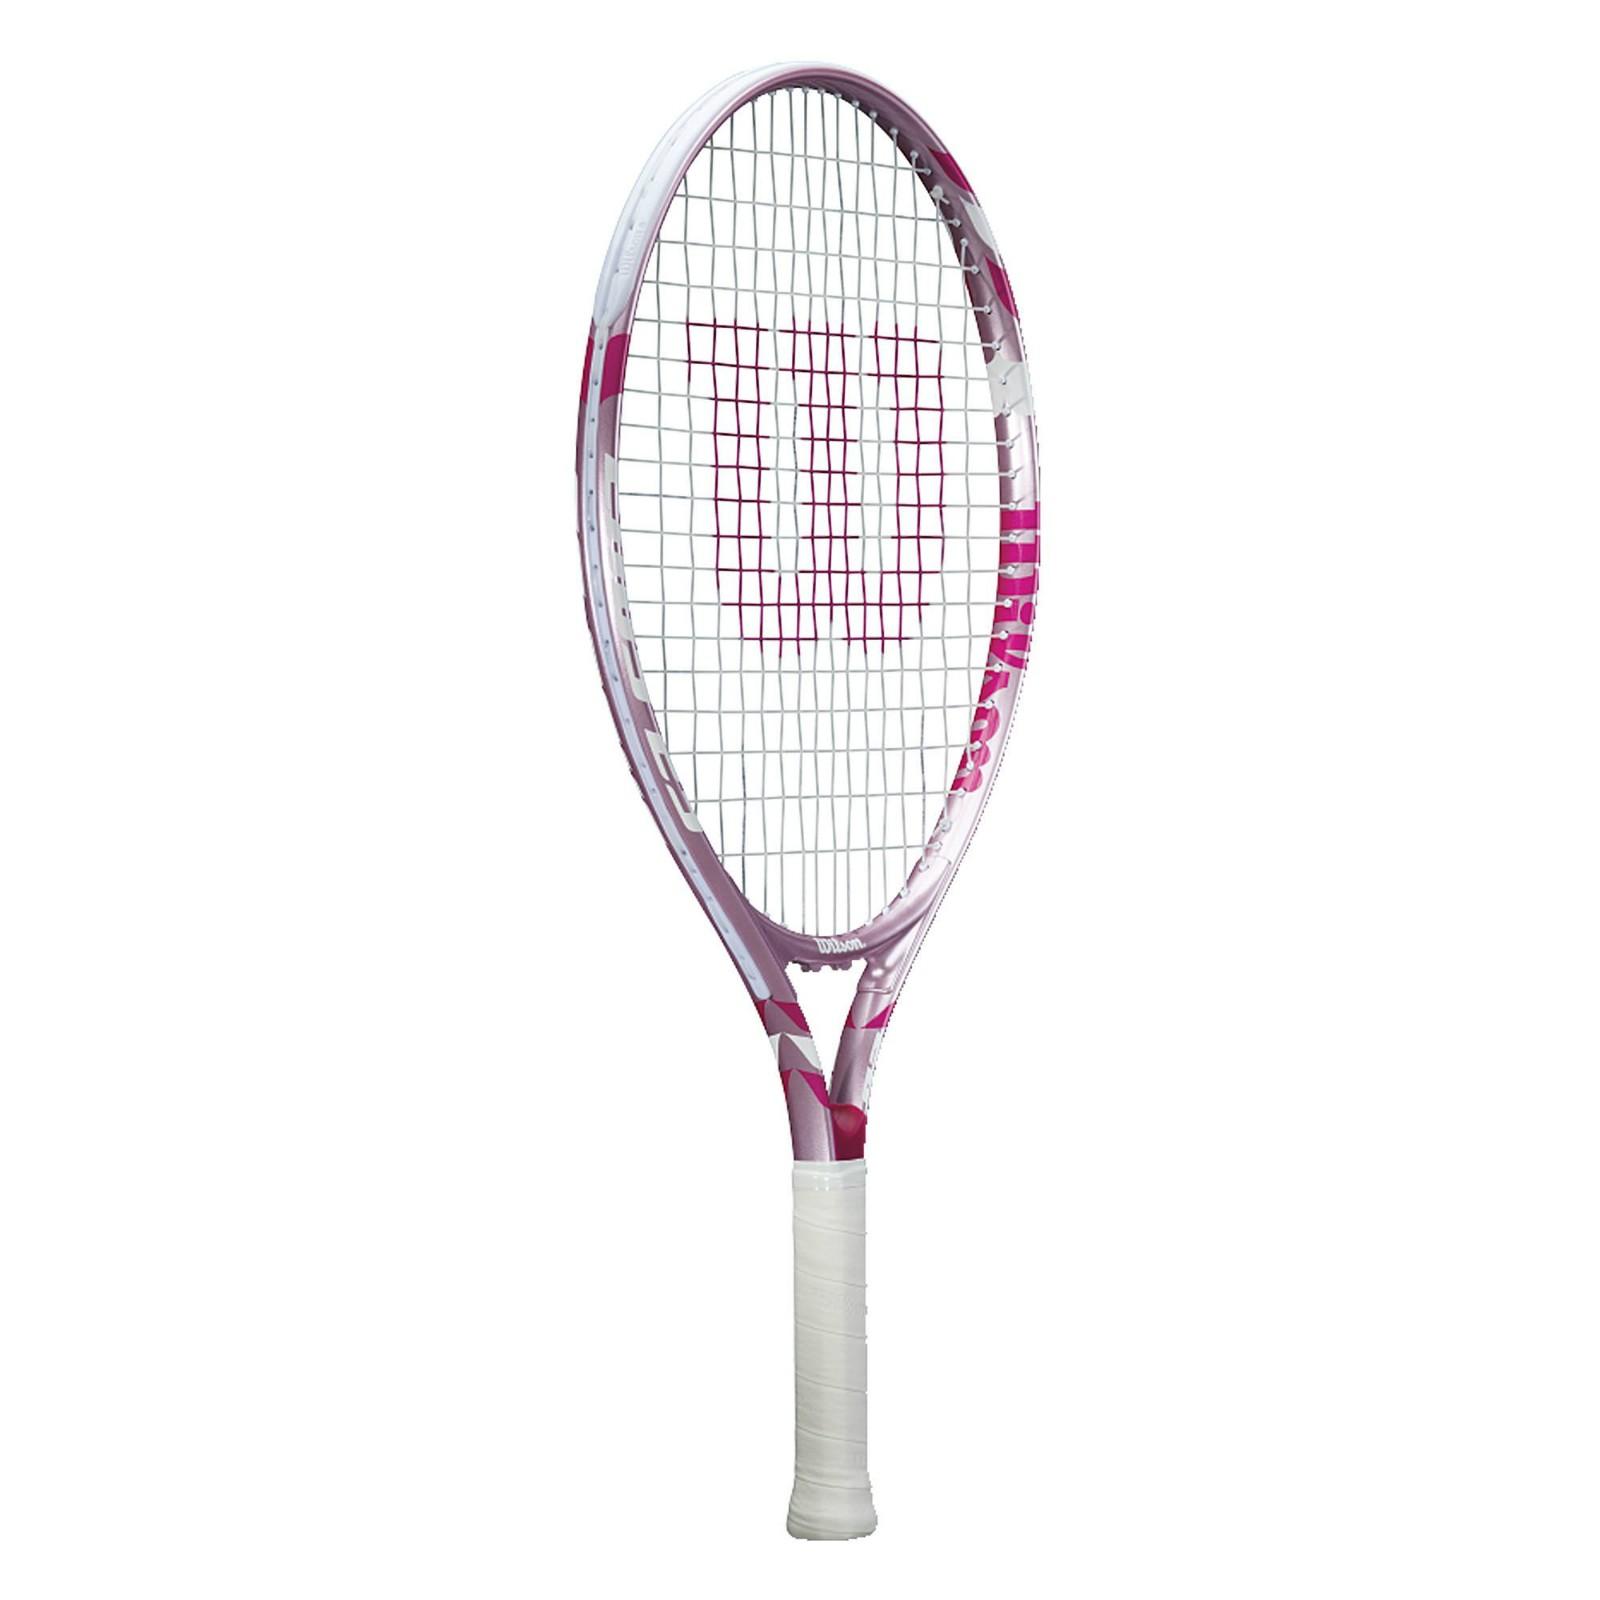 Dětská tenisová raketa Wilson Envy 23 pink